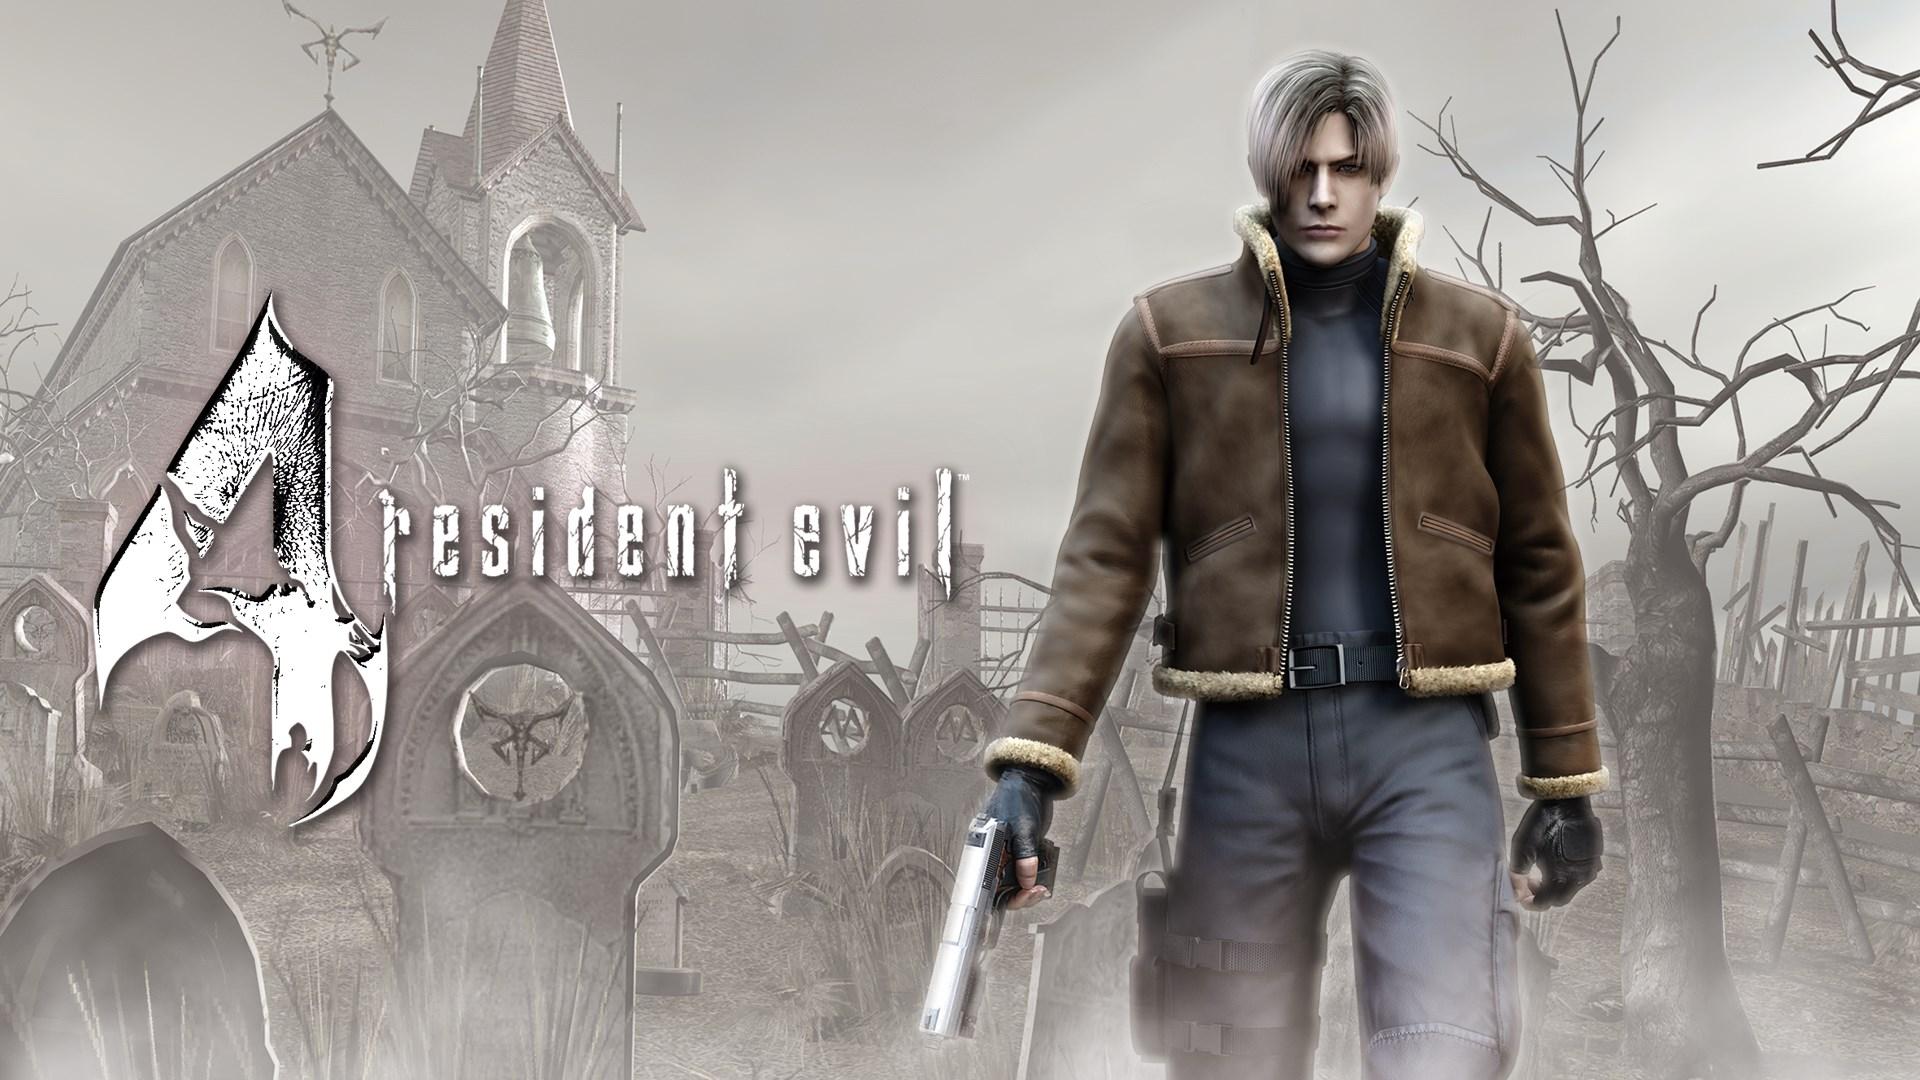 resident evil 4 - 『バイオハザードRE4』、キタ━━━━(゚∀。)━━━━!?